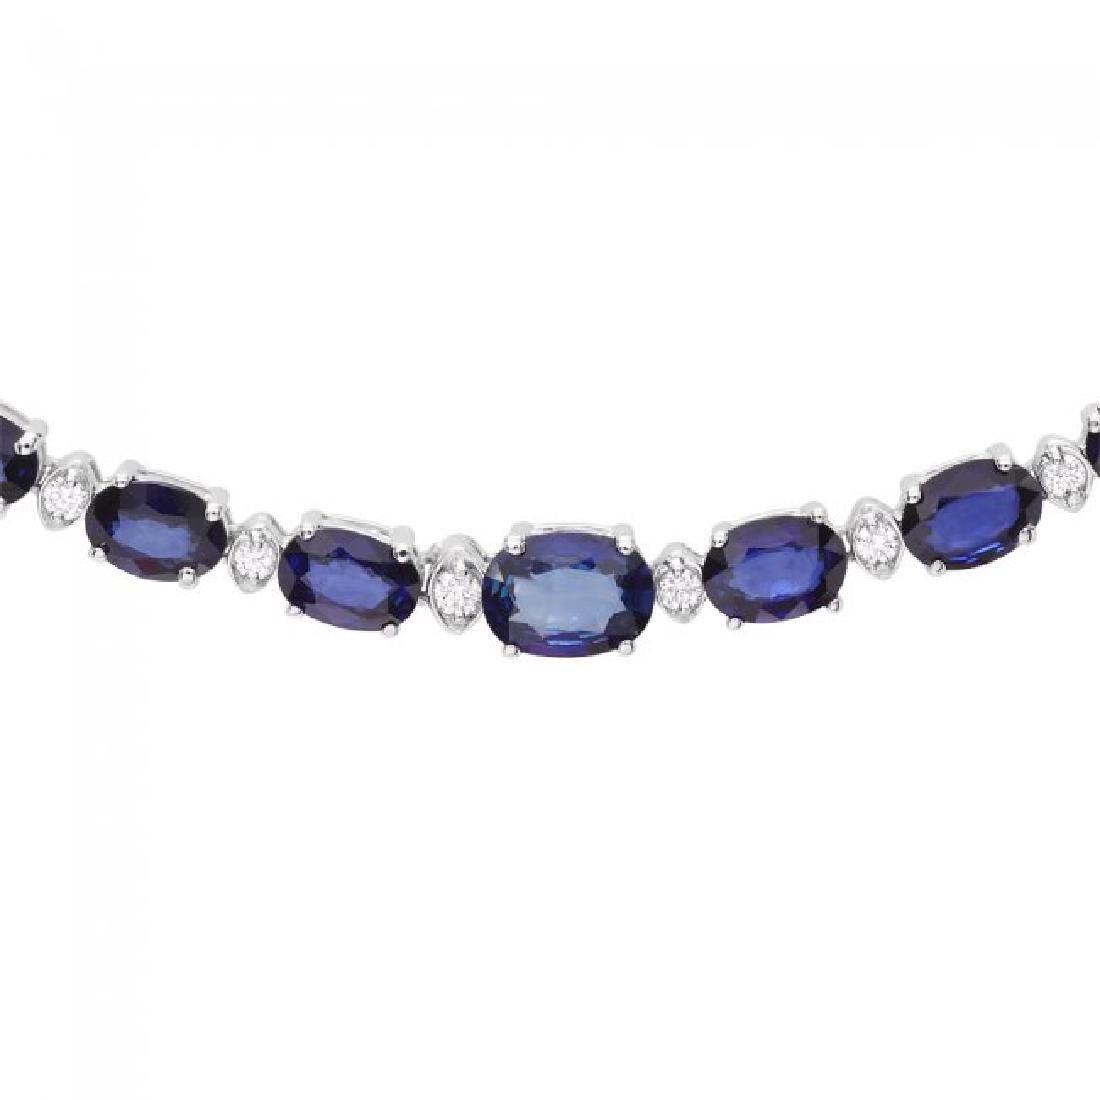 14k Gold 30ct Sapphire 1.10ct Diamond Necklace - 2